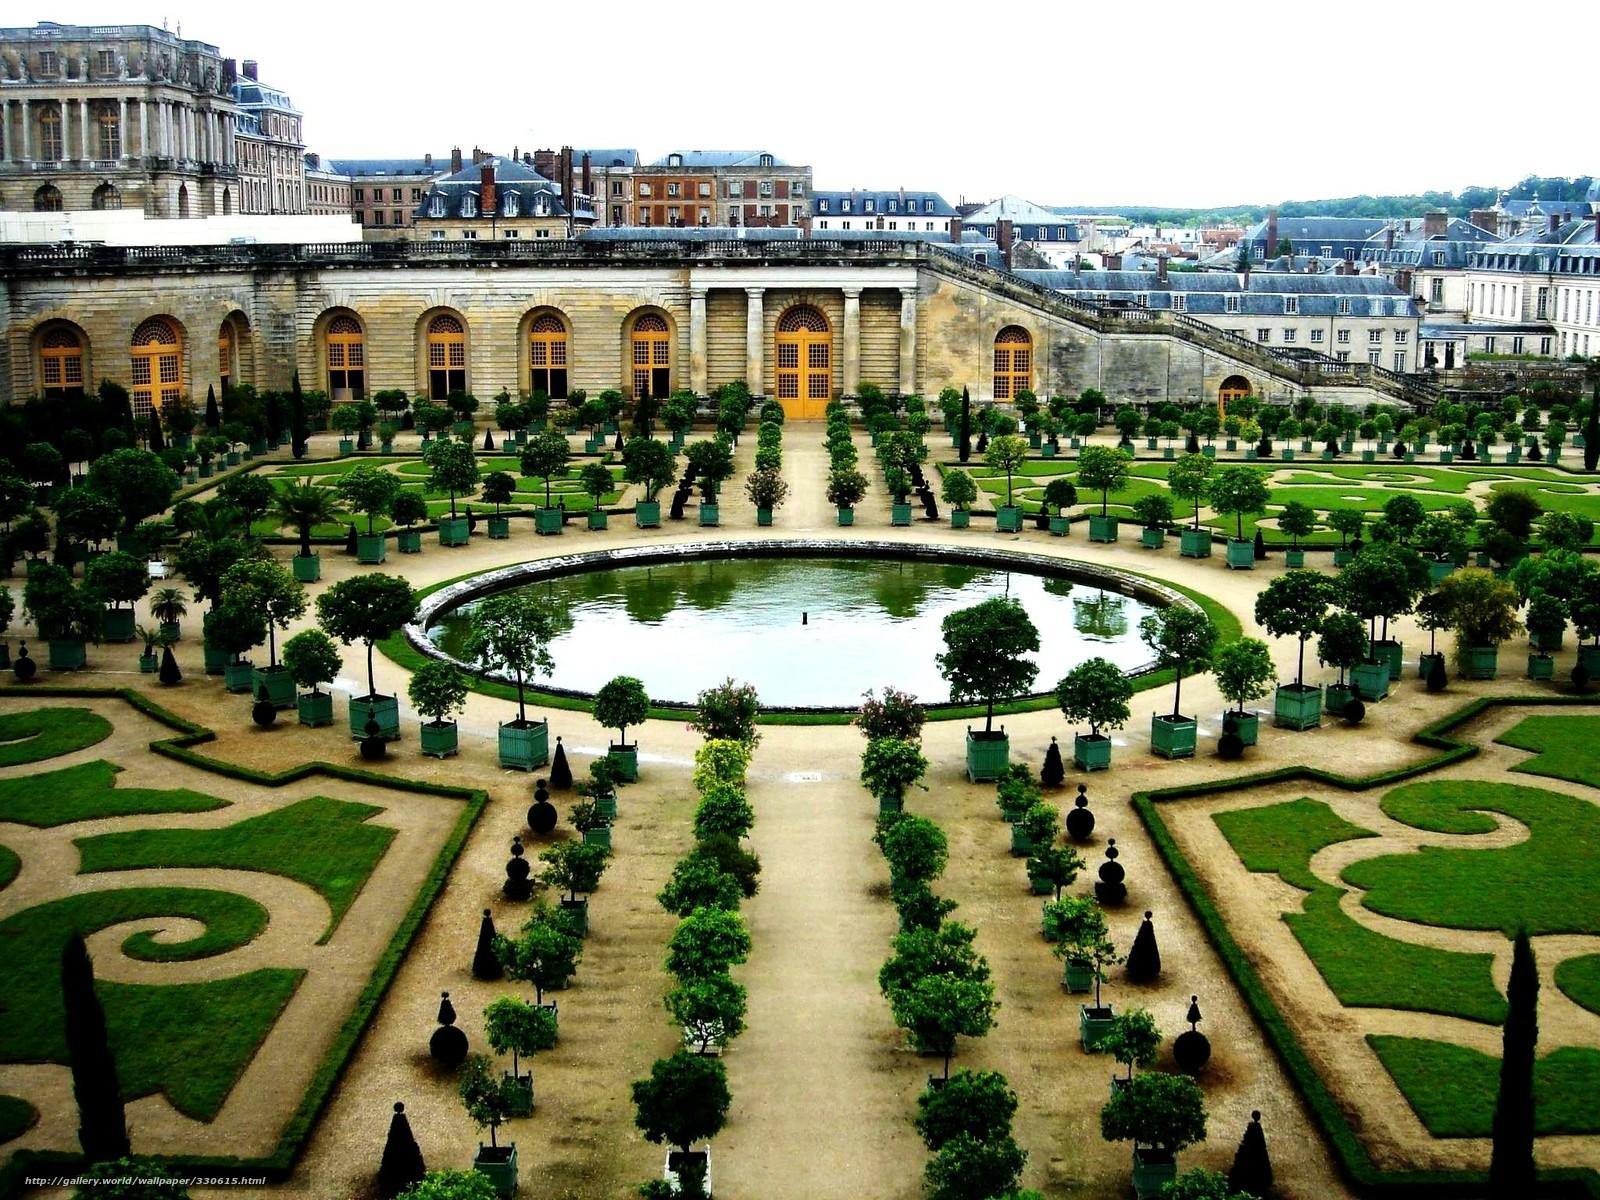 Tlcharger fond d 39 ecran france versailles jardin btiment for Versailles jardin gratuit